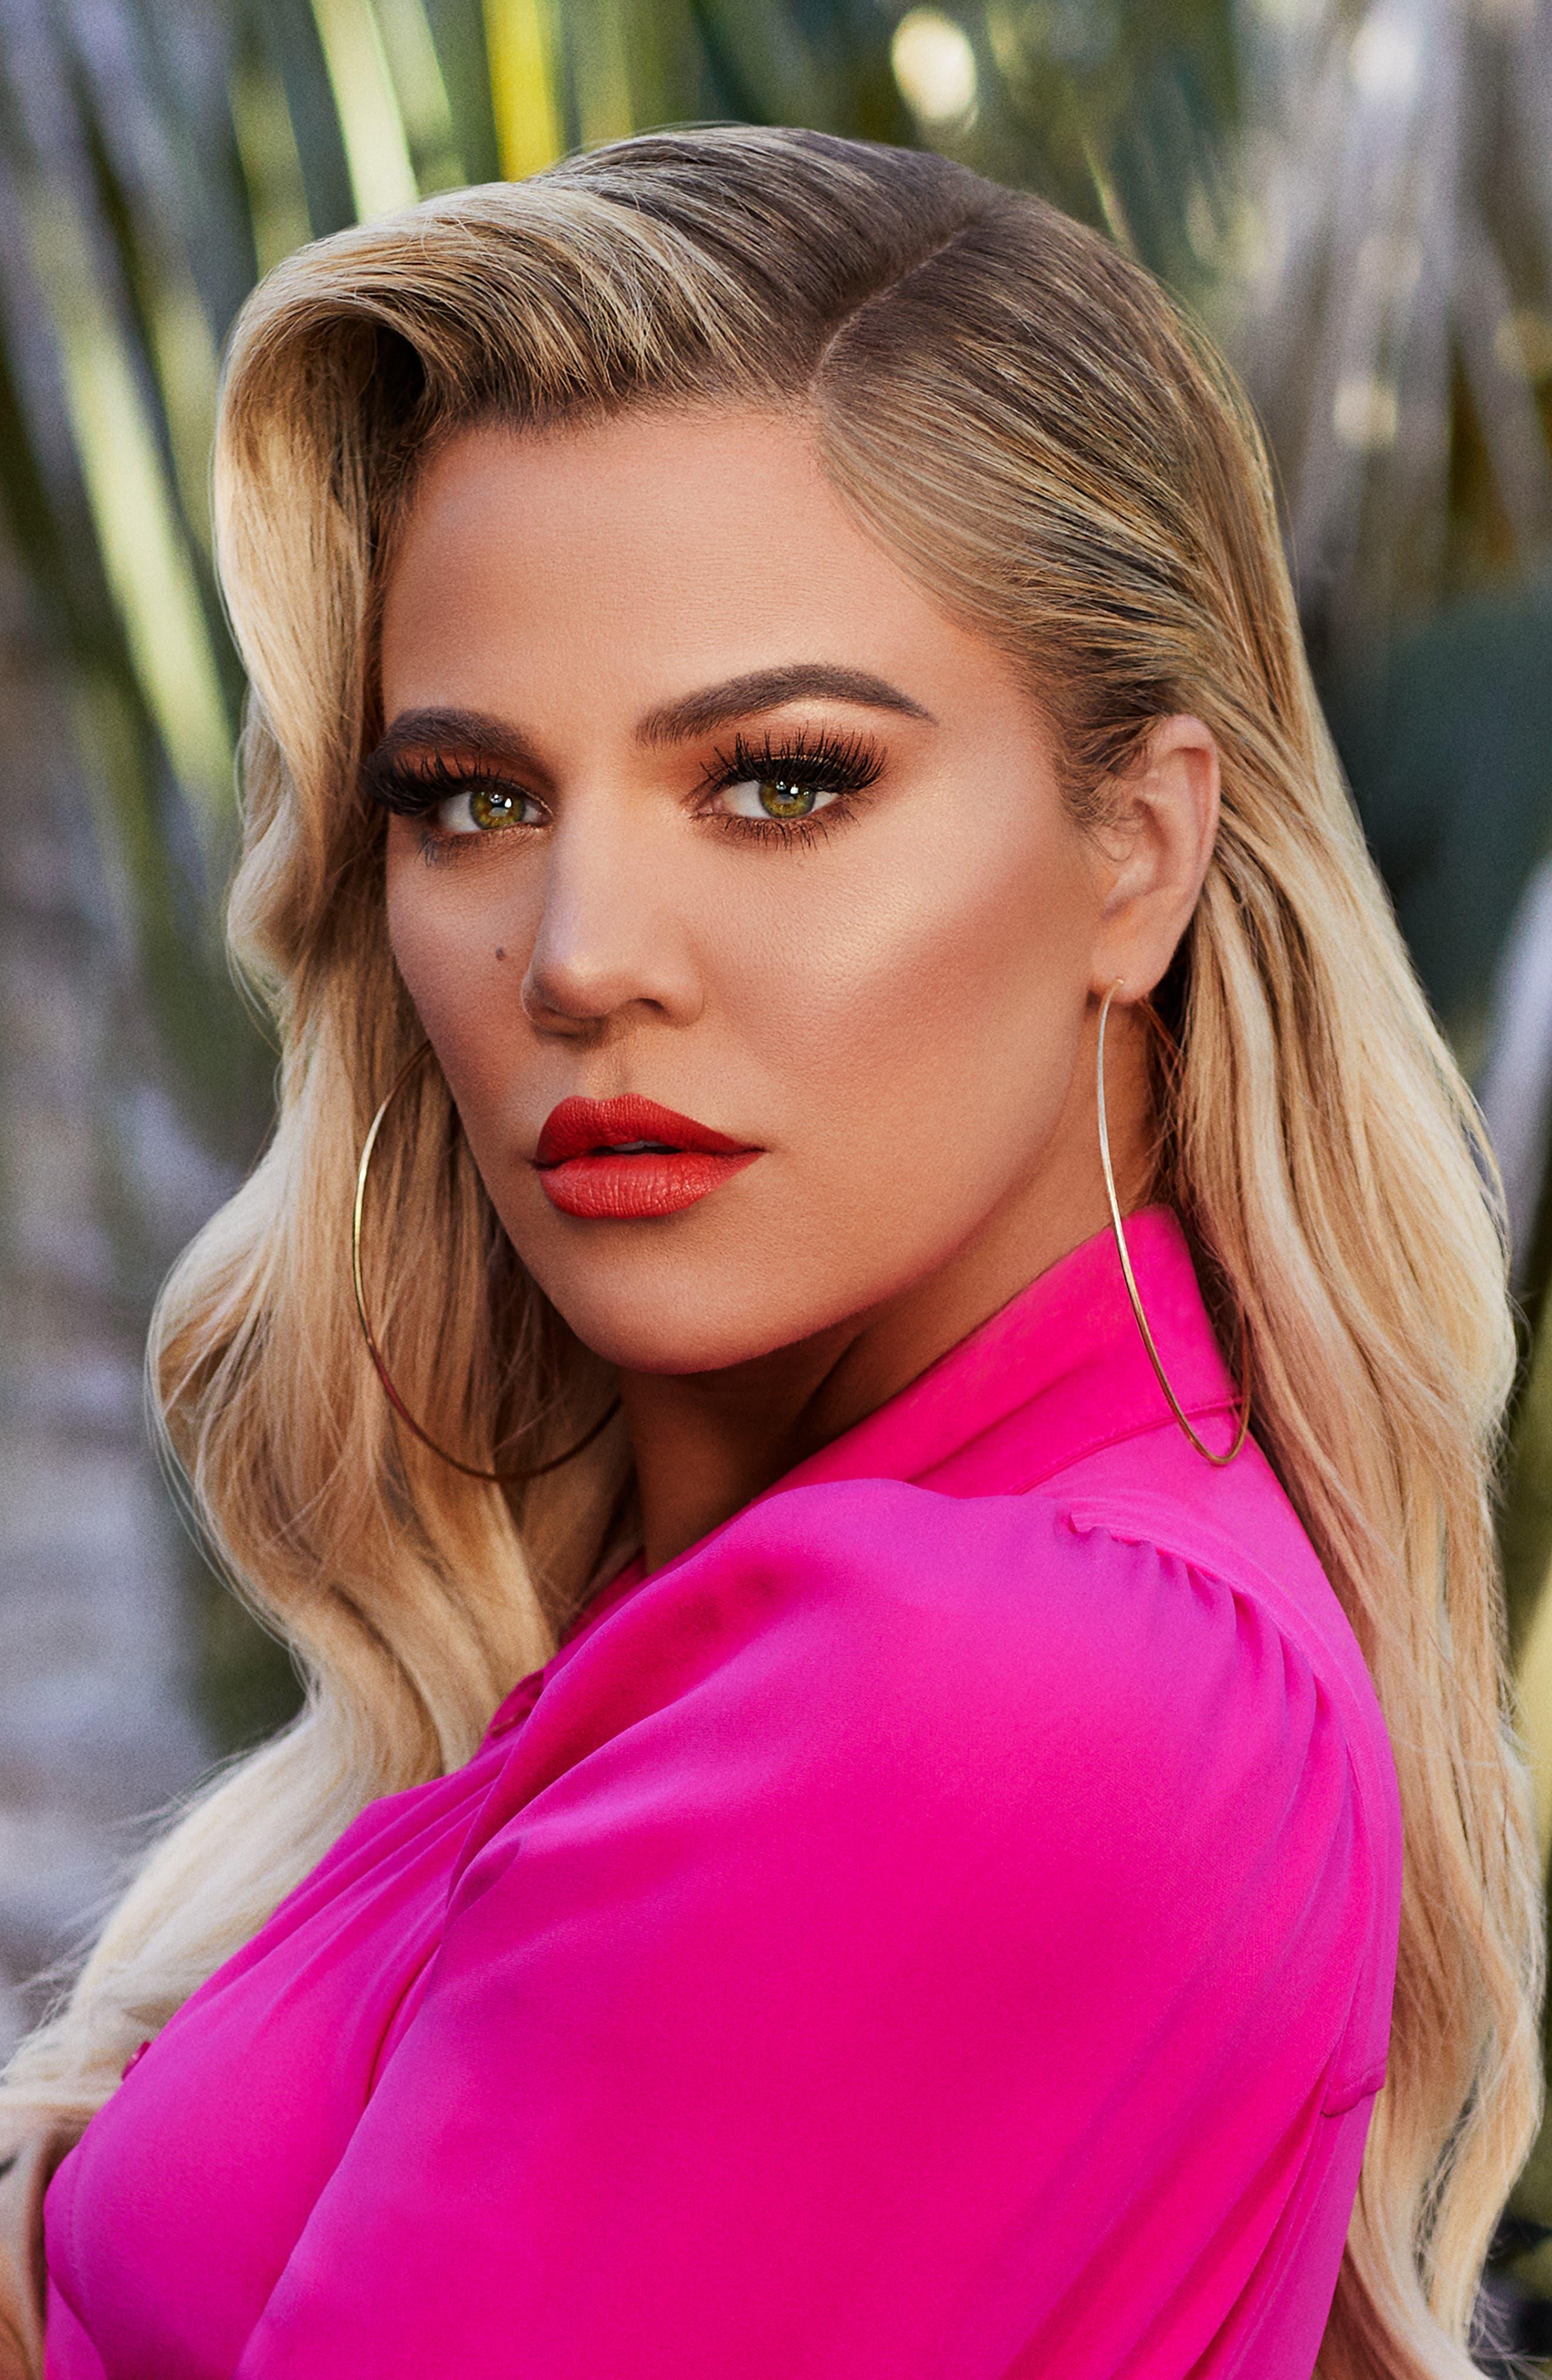 BECCA COSMETICS, BECCA x Khloé Kardashian & Malika Haqq Bronze, Blush & Glow Palette, Alternate thumbnail 6, color, KHLOE